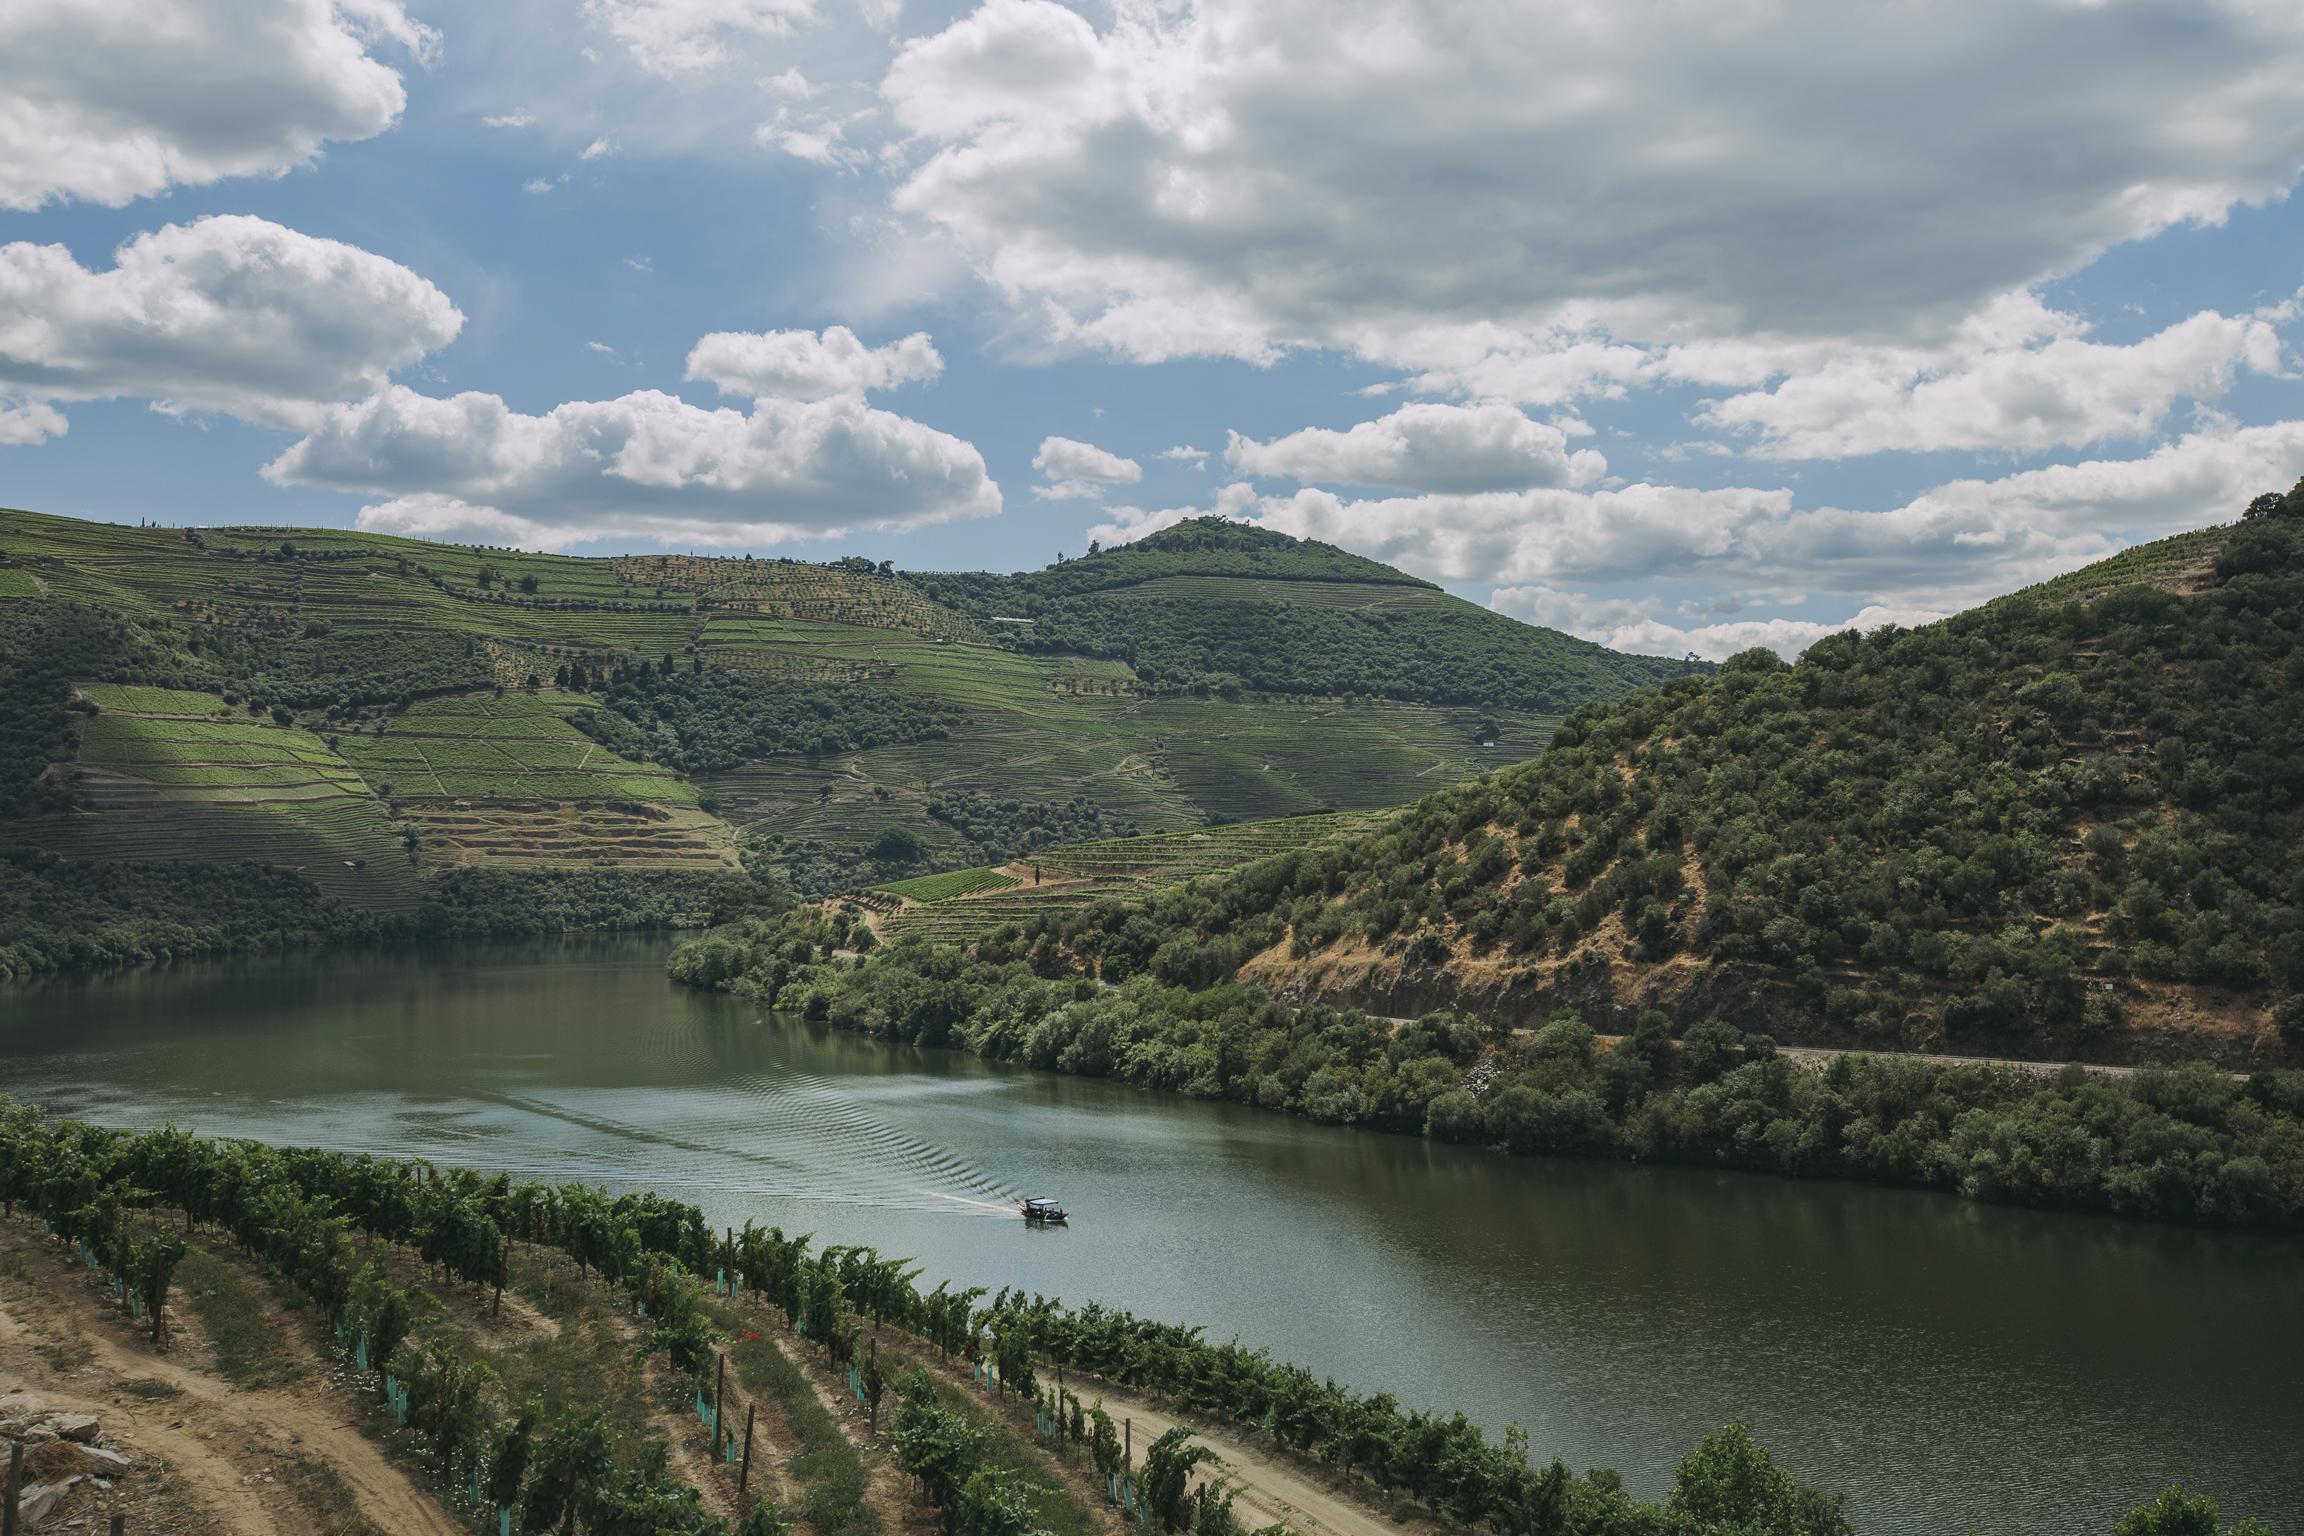 Portugal Cruises: Hidden Treasures from Porto to Douro